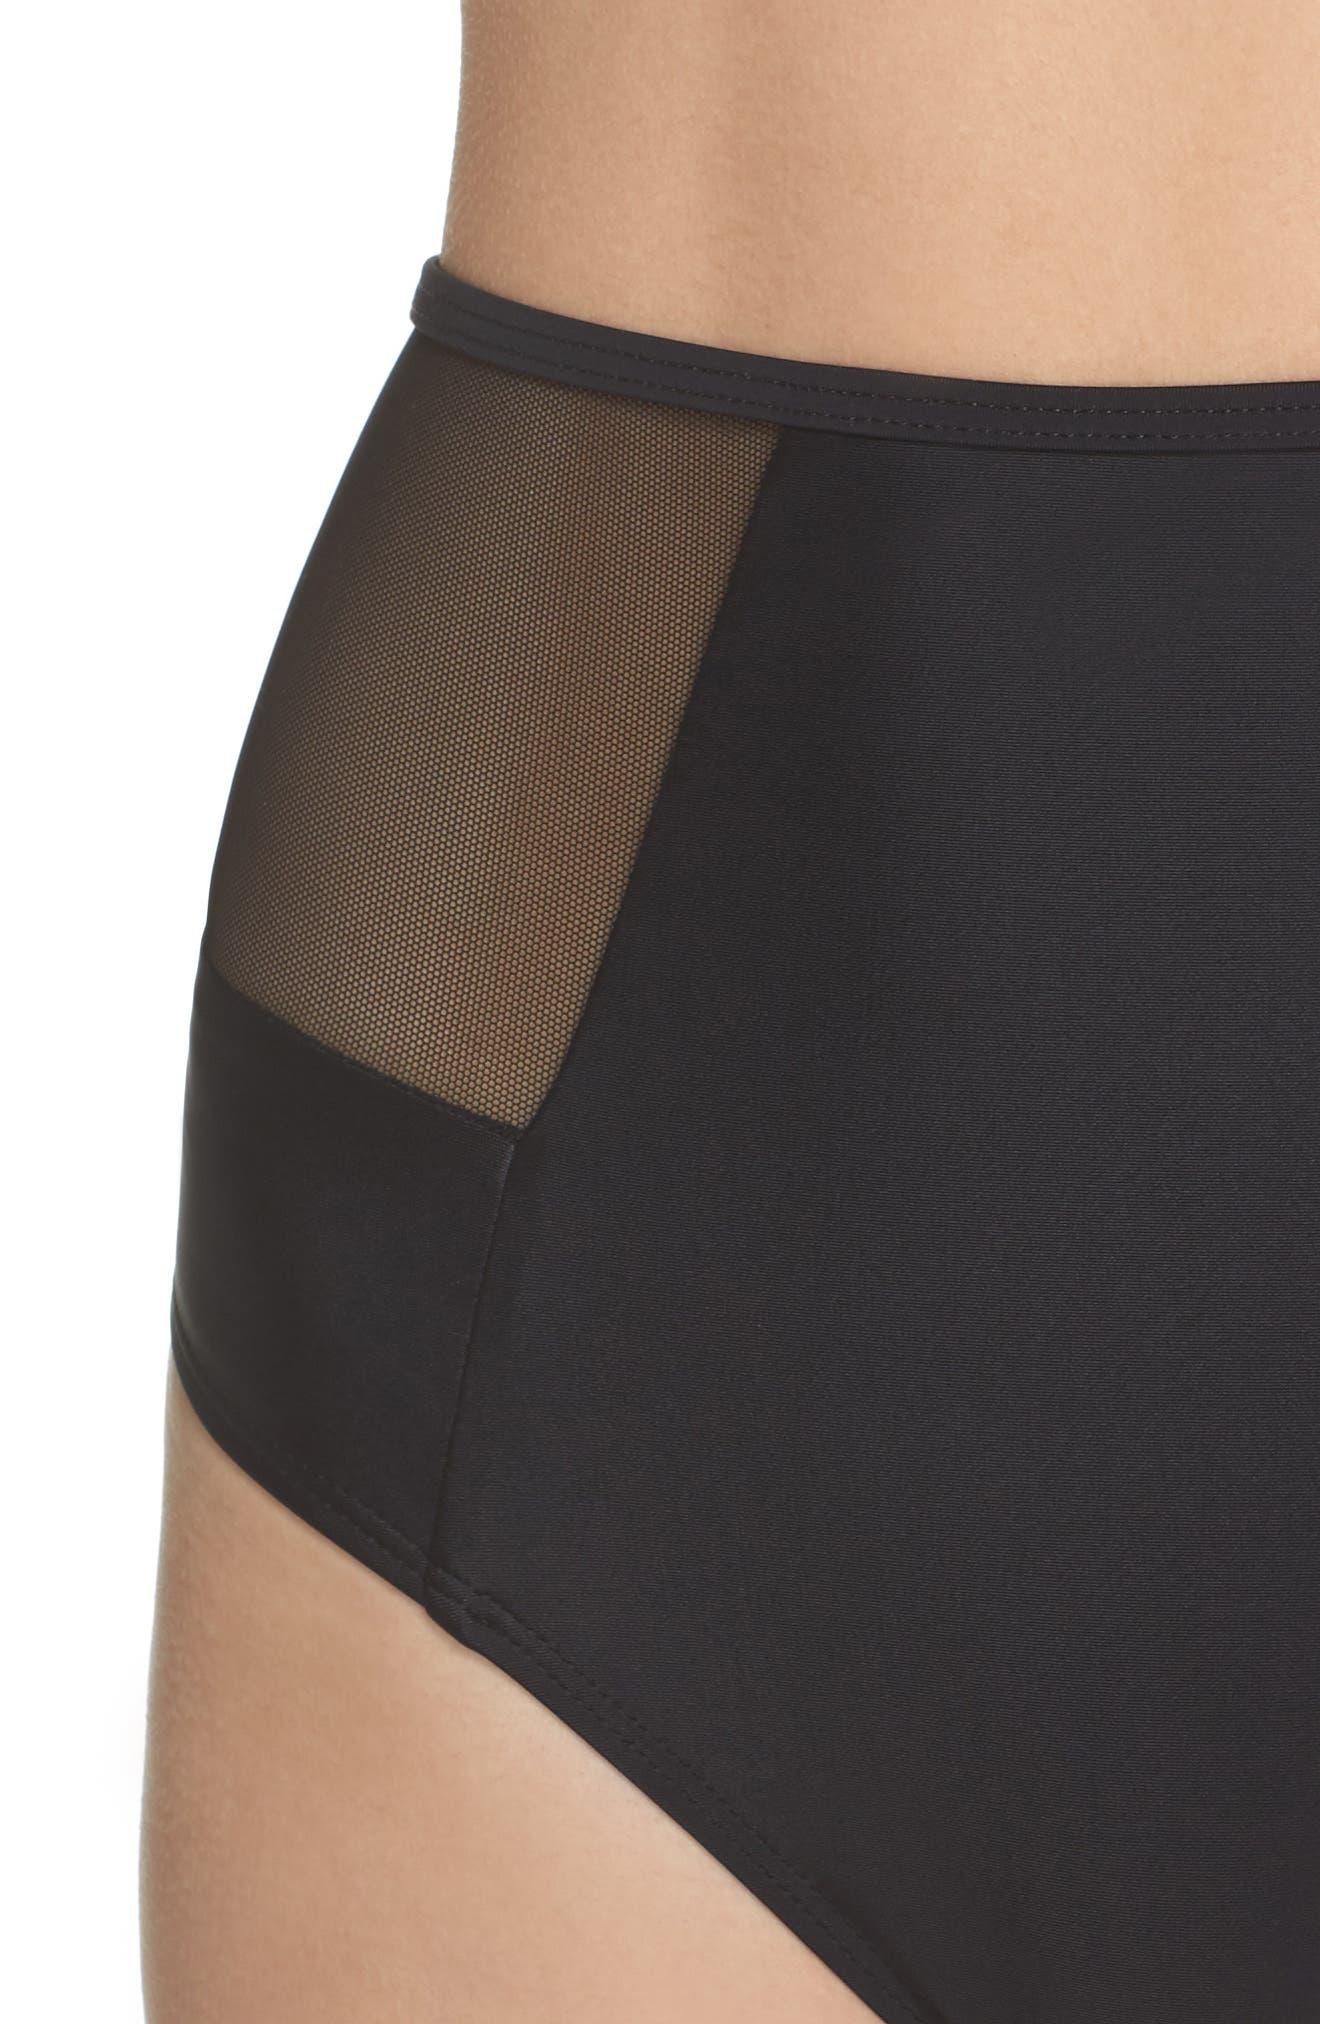 Contour High Waist Bikini Bottoms,                             Alternate thumbnail 4, color,                             Black